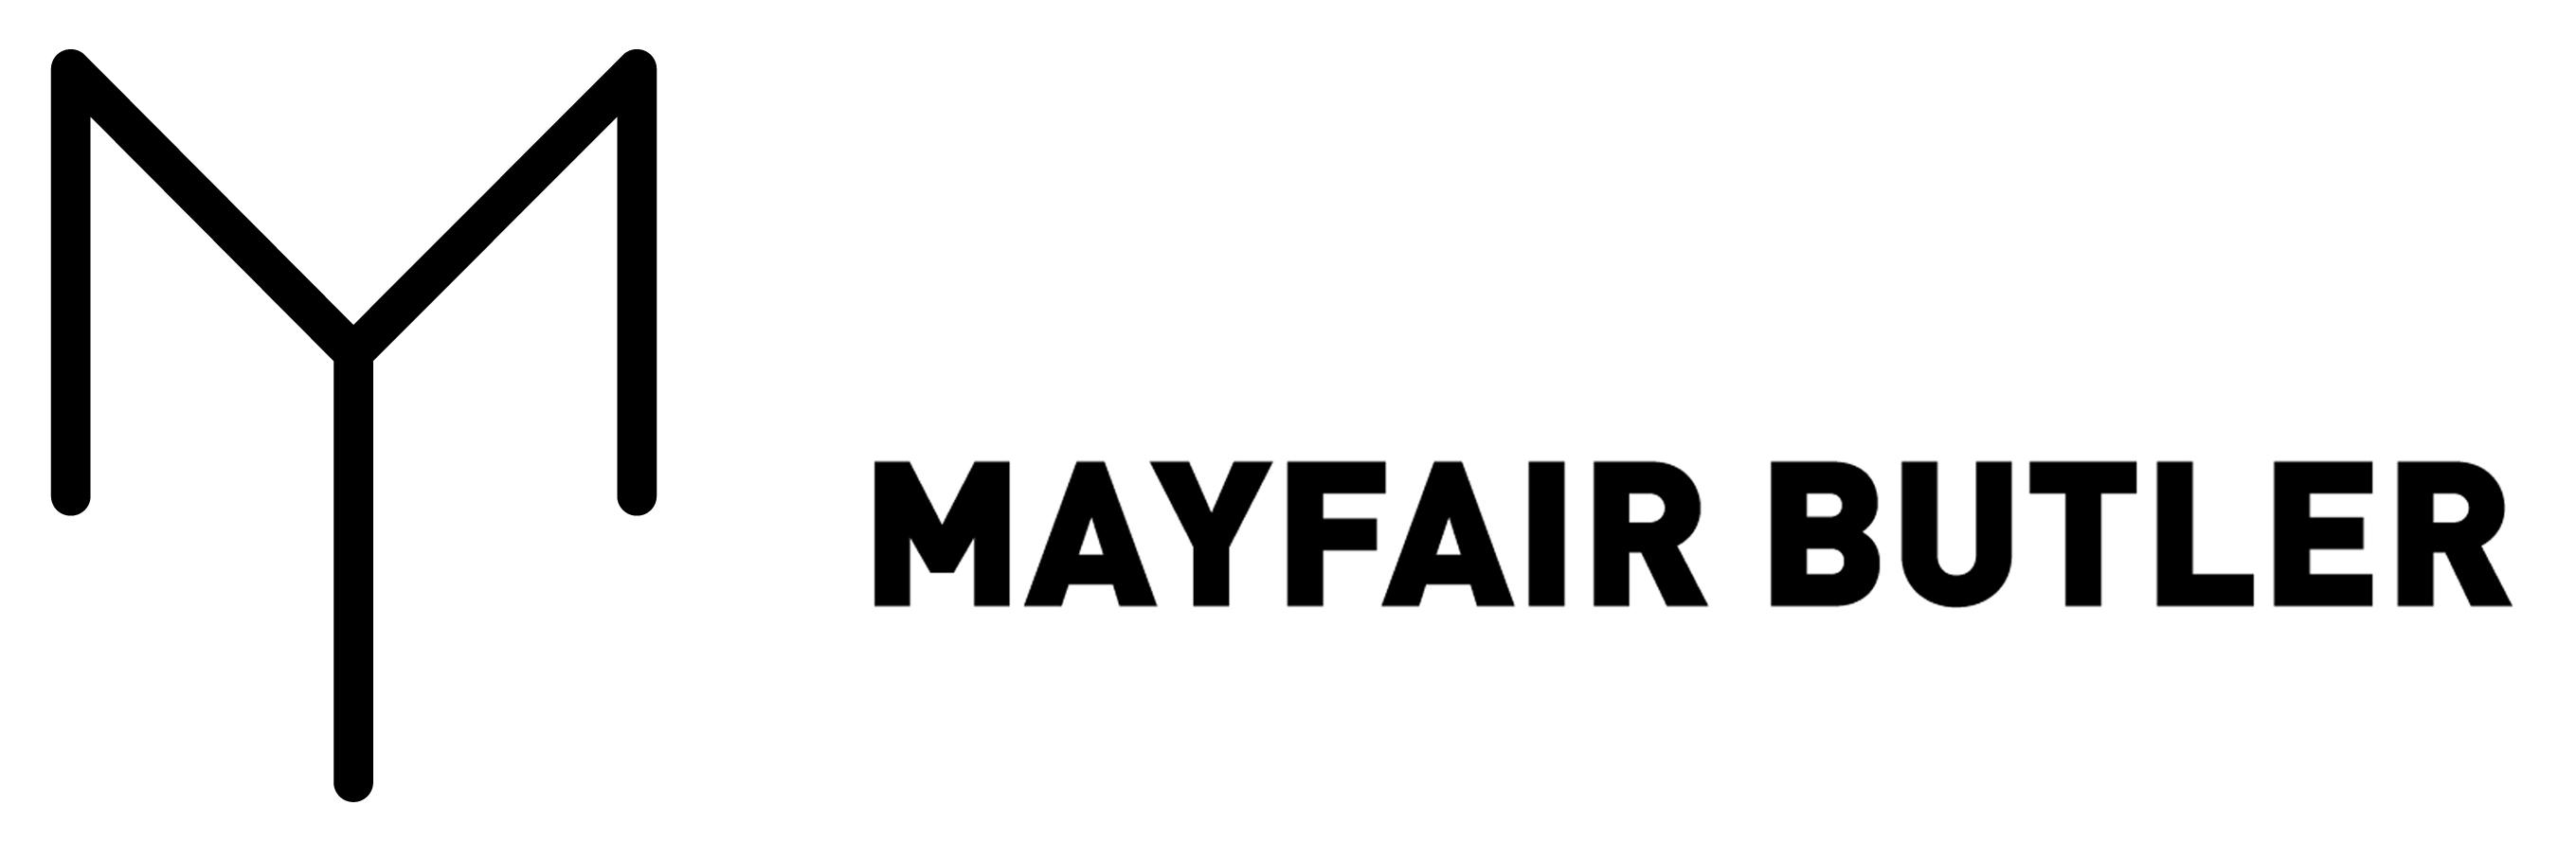 Mayfair Butler Fitouts